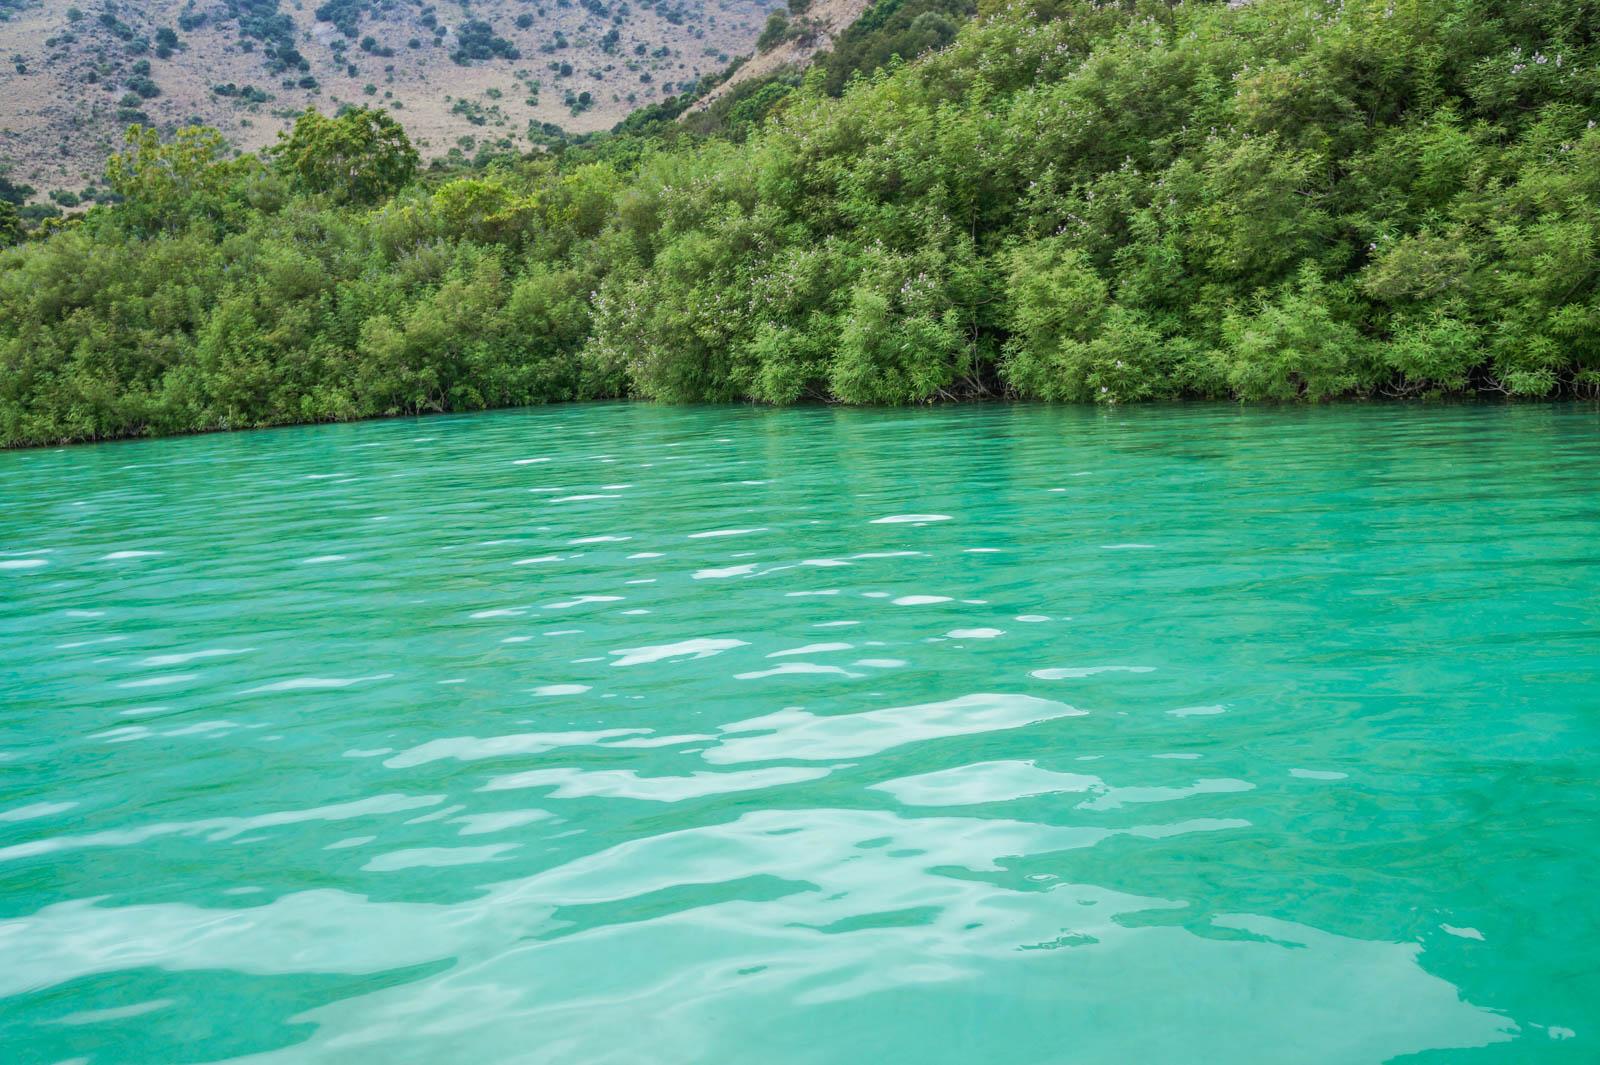 kourna-lake-crete-greece-la-vie-en-blog-all-rights-reserved-6